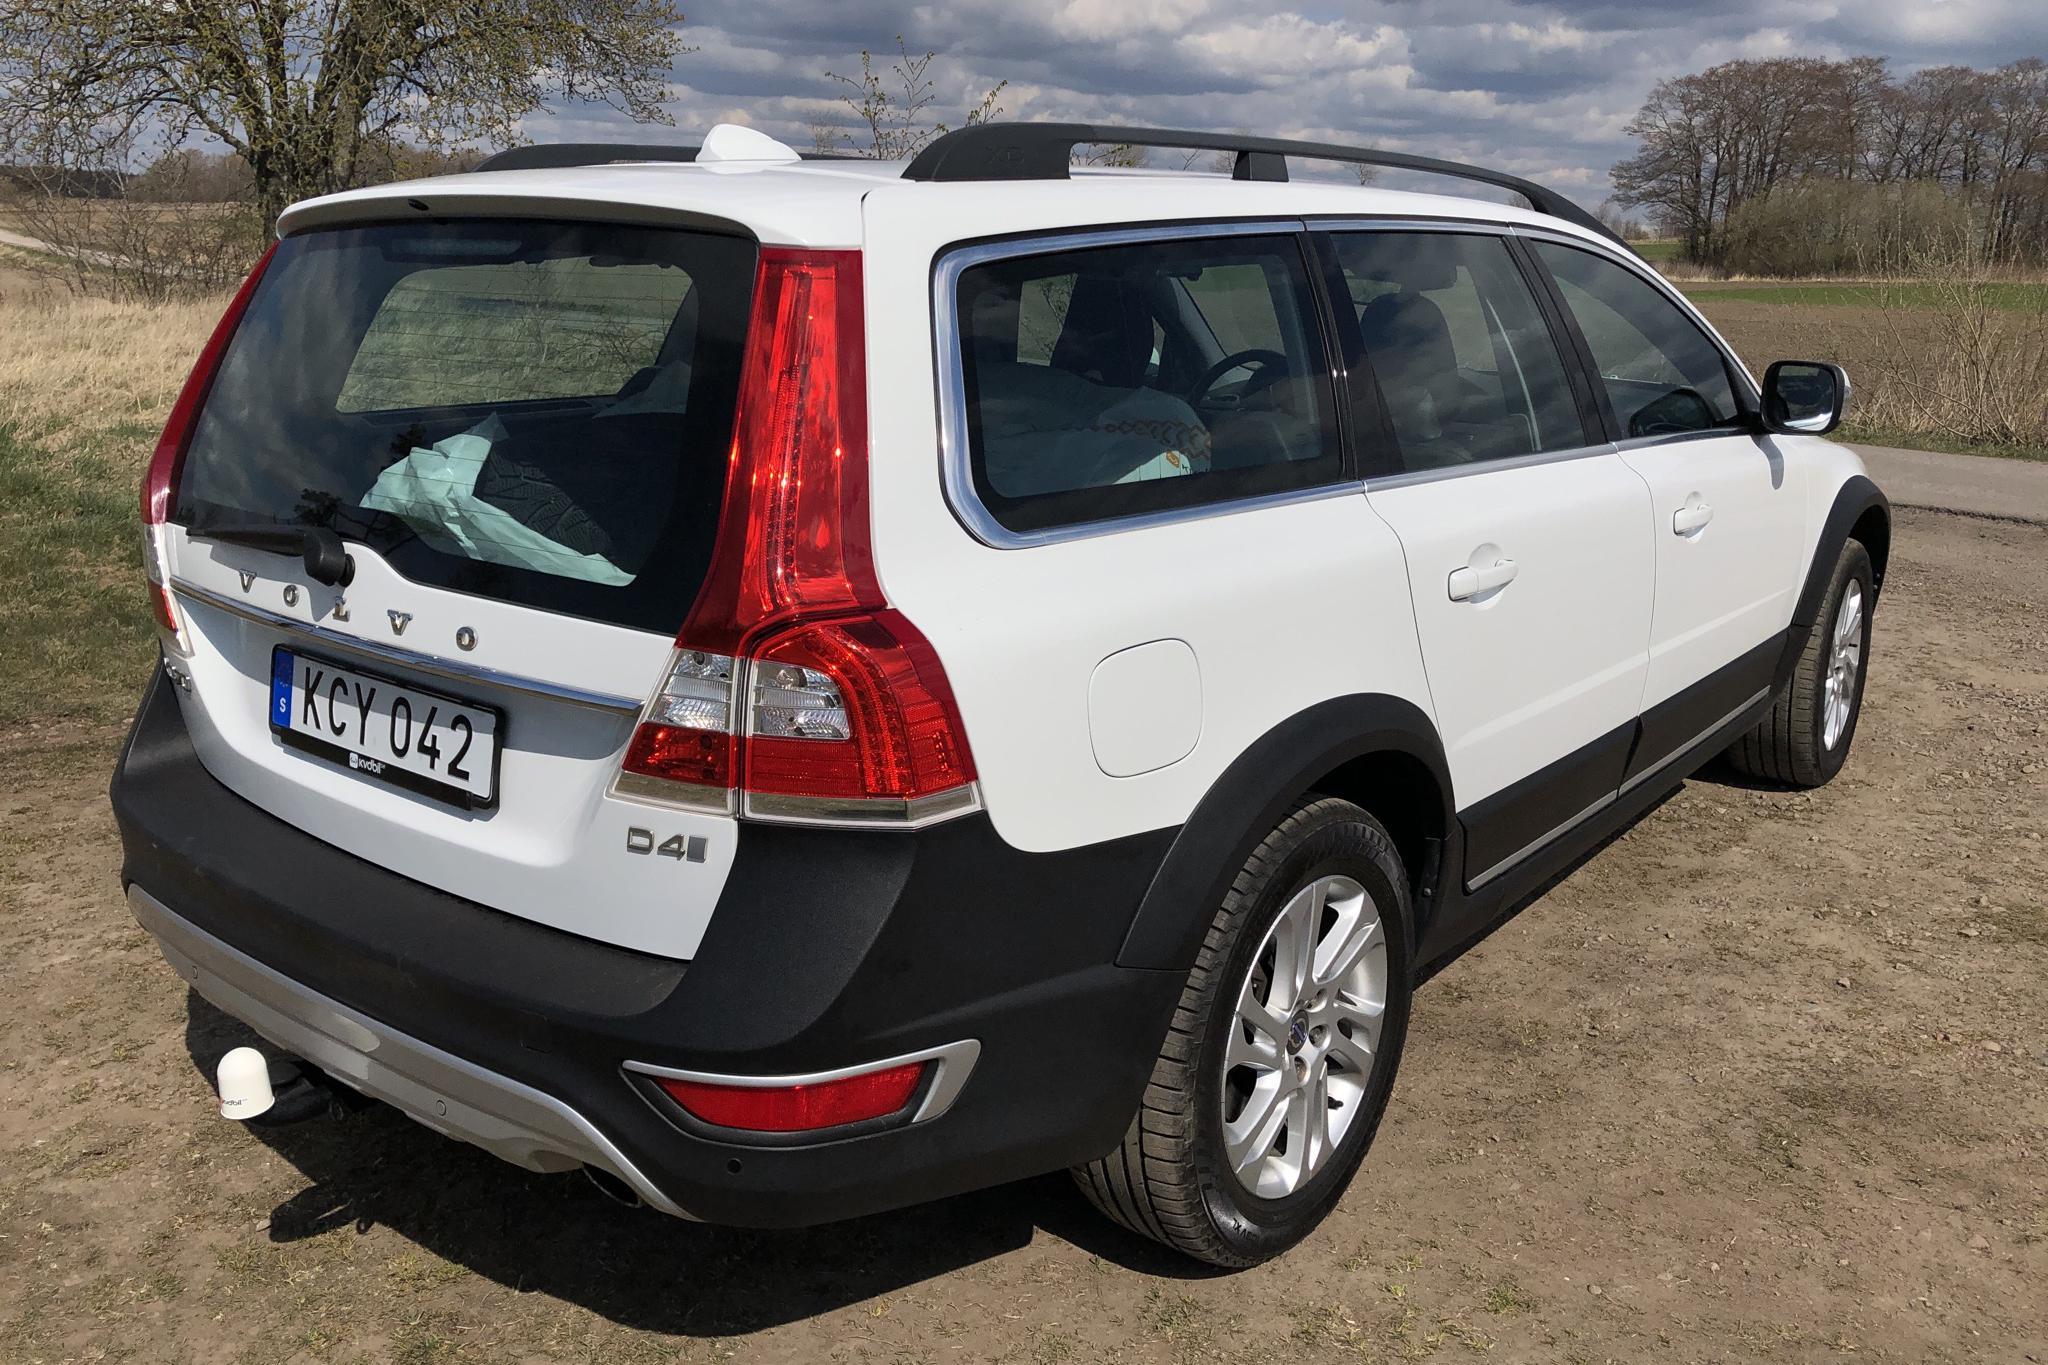 Volvo XC70 II D4 2WD (181hk) - 156 890 km - Manual - white - 2016